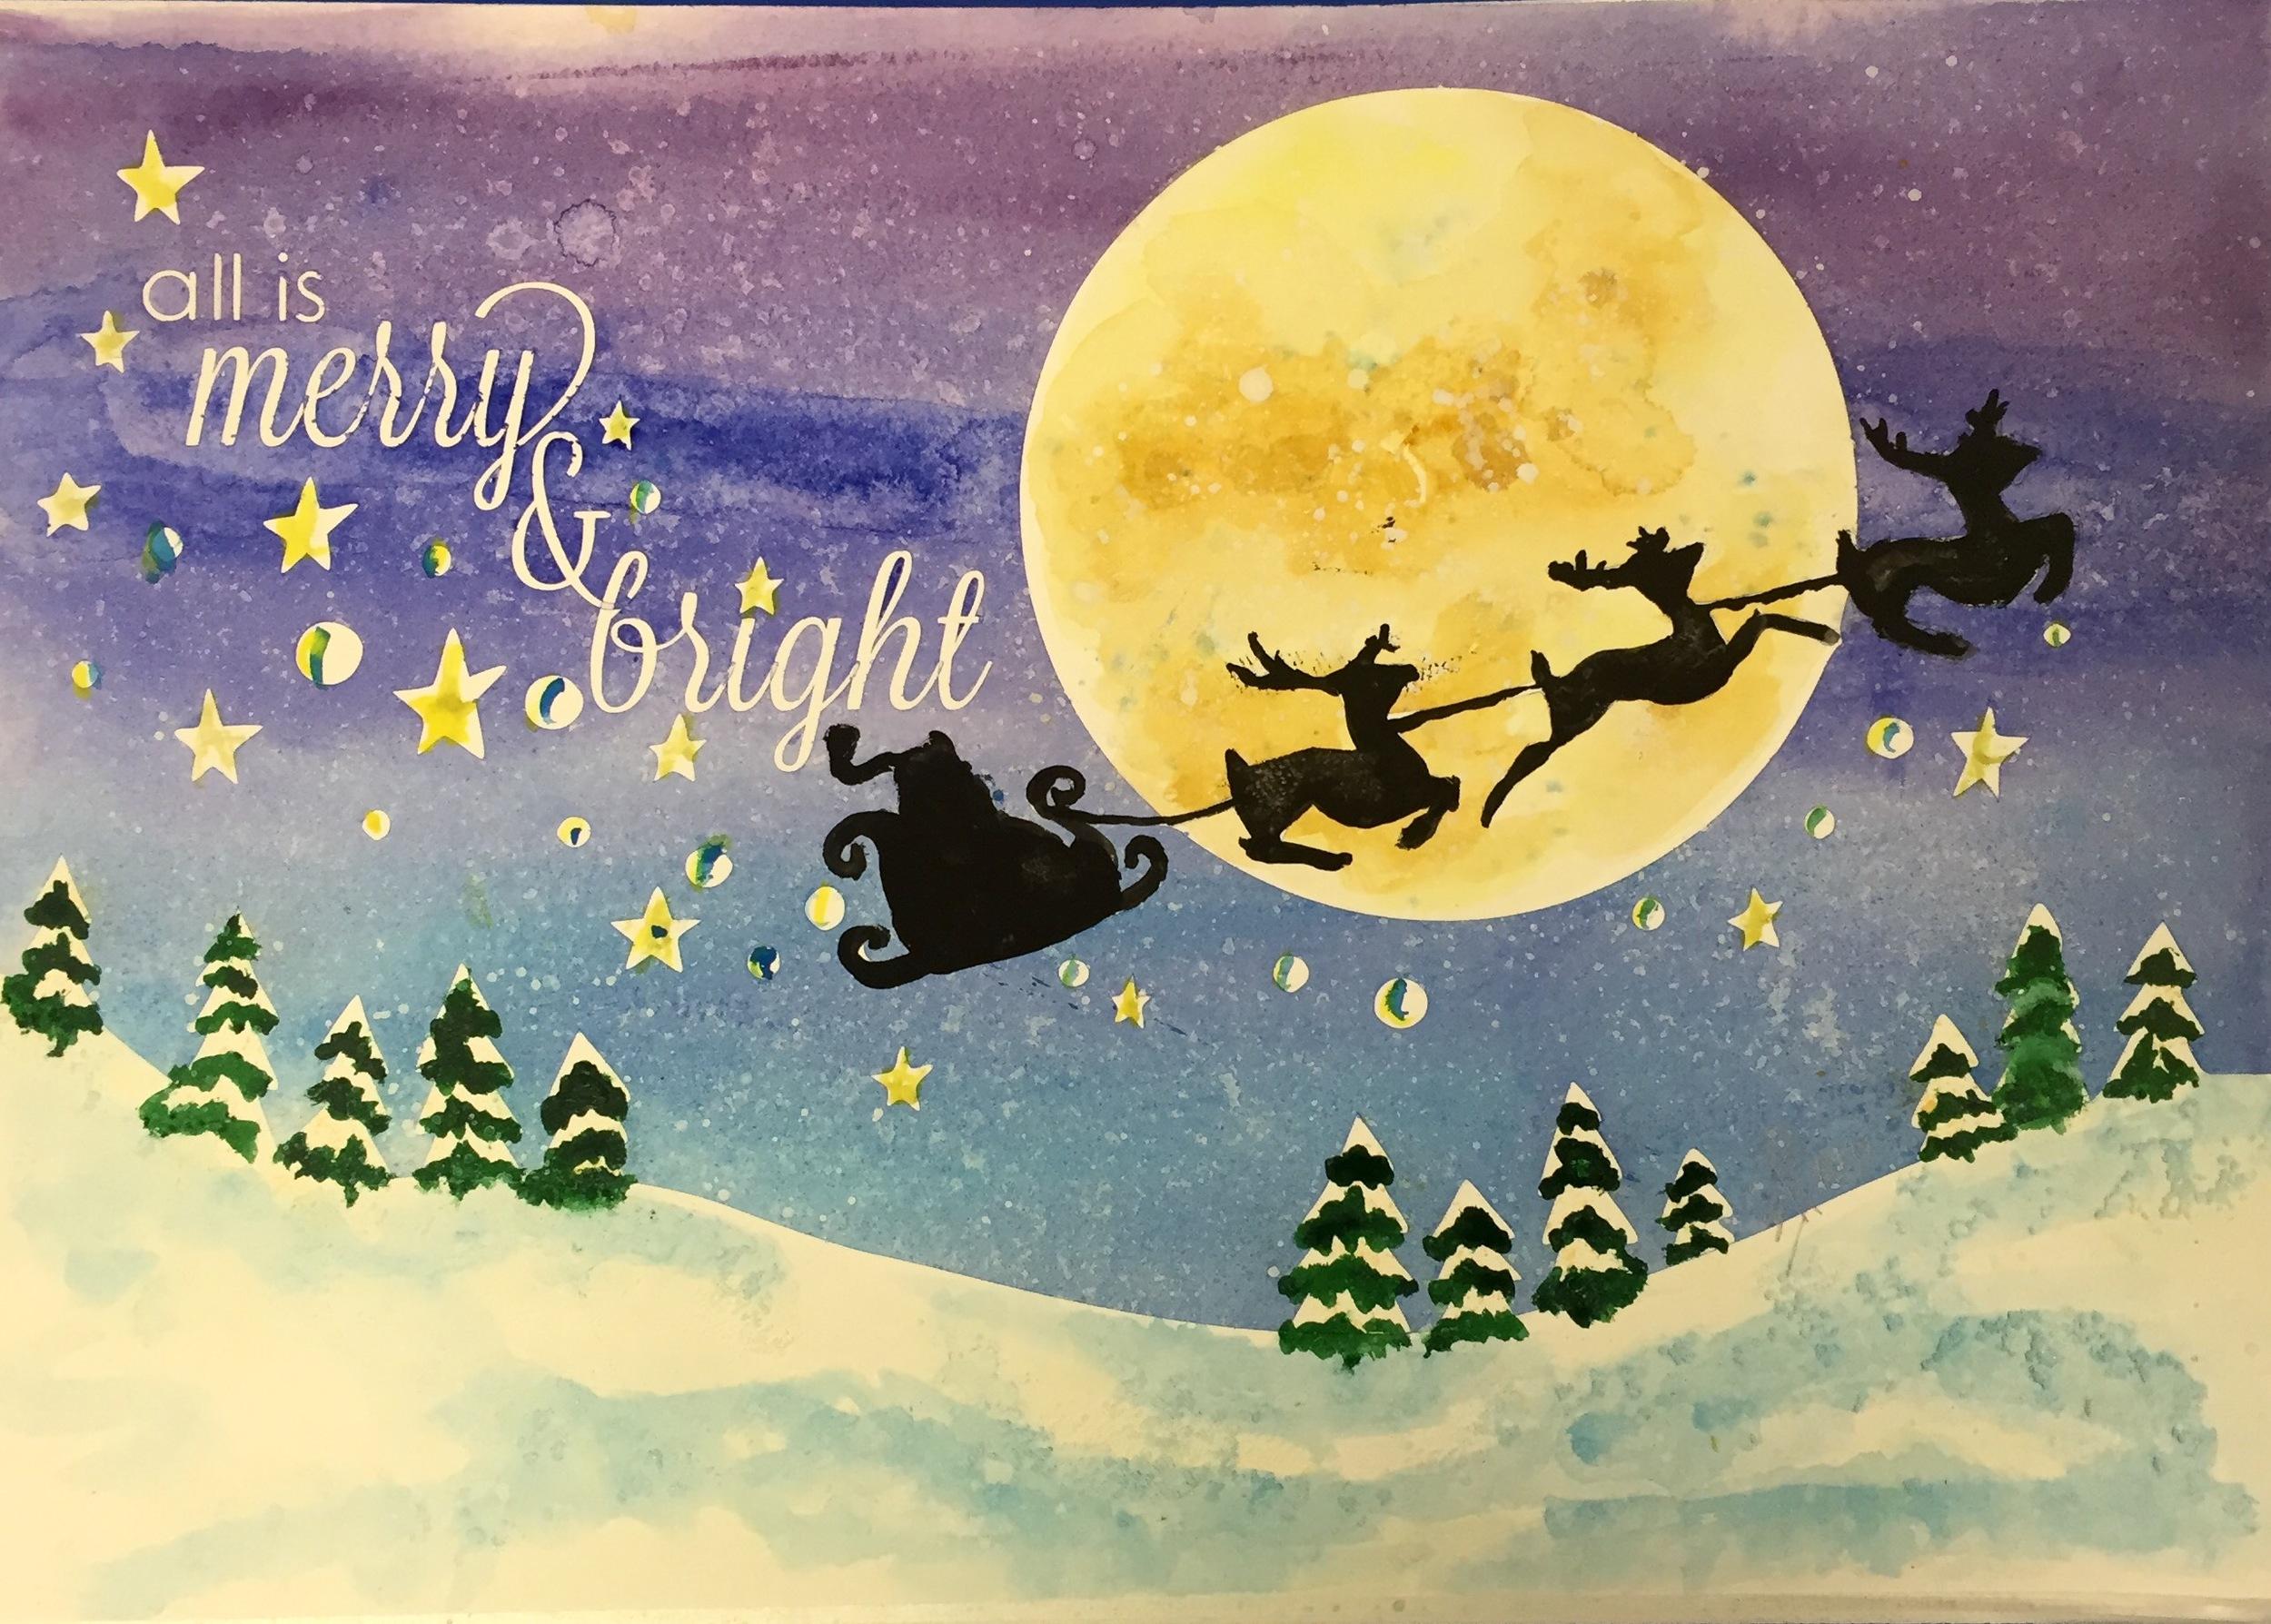 Santa - Merry & Bright